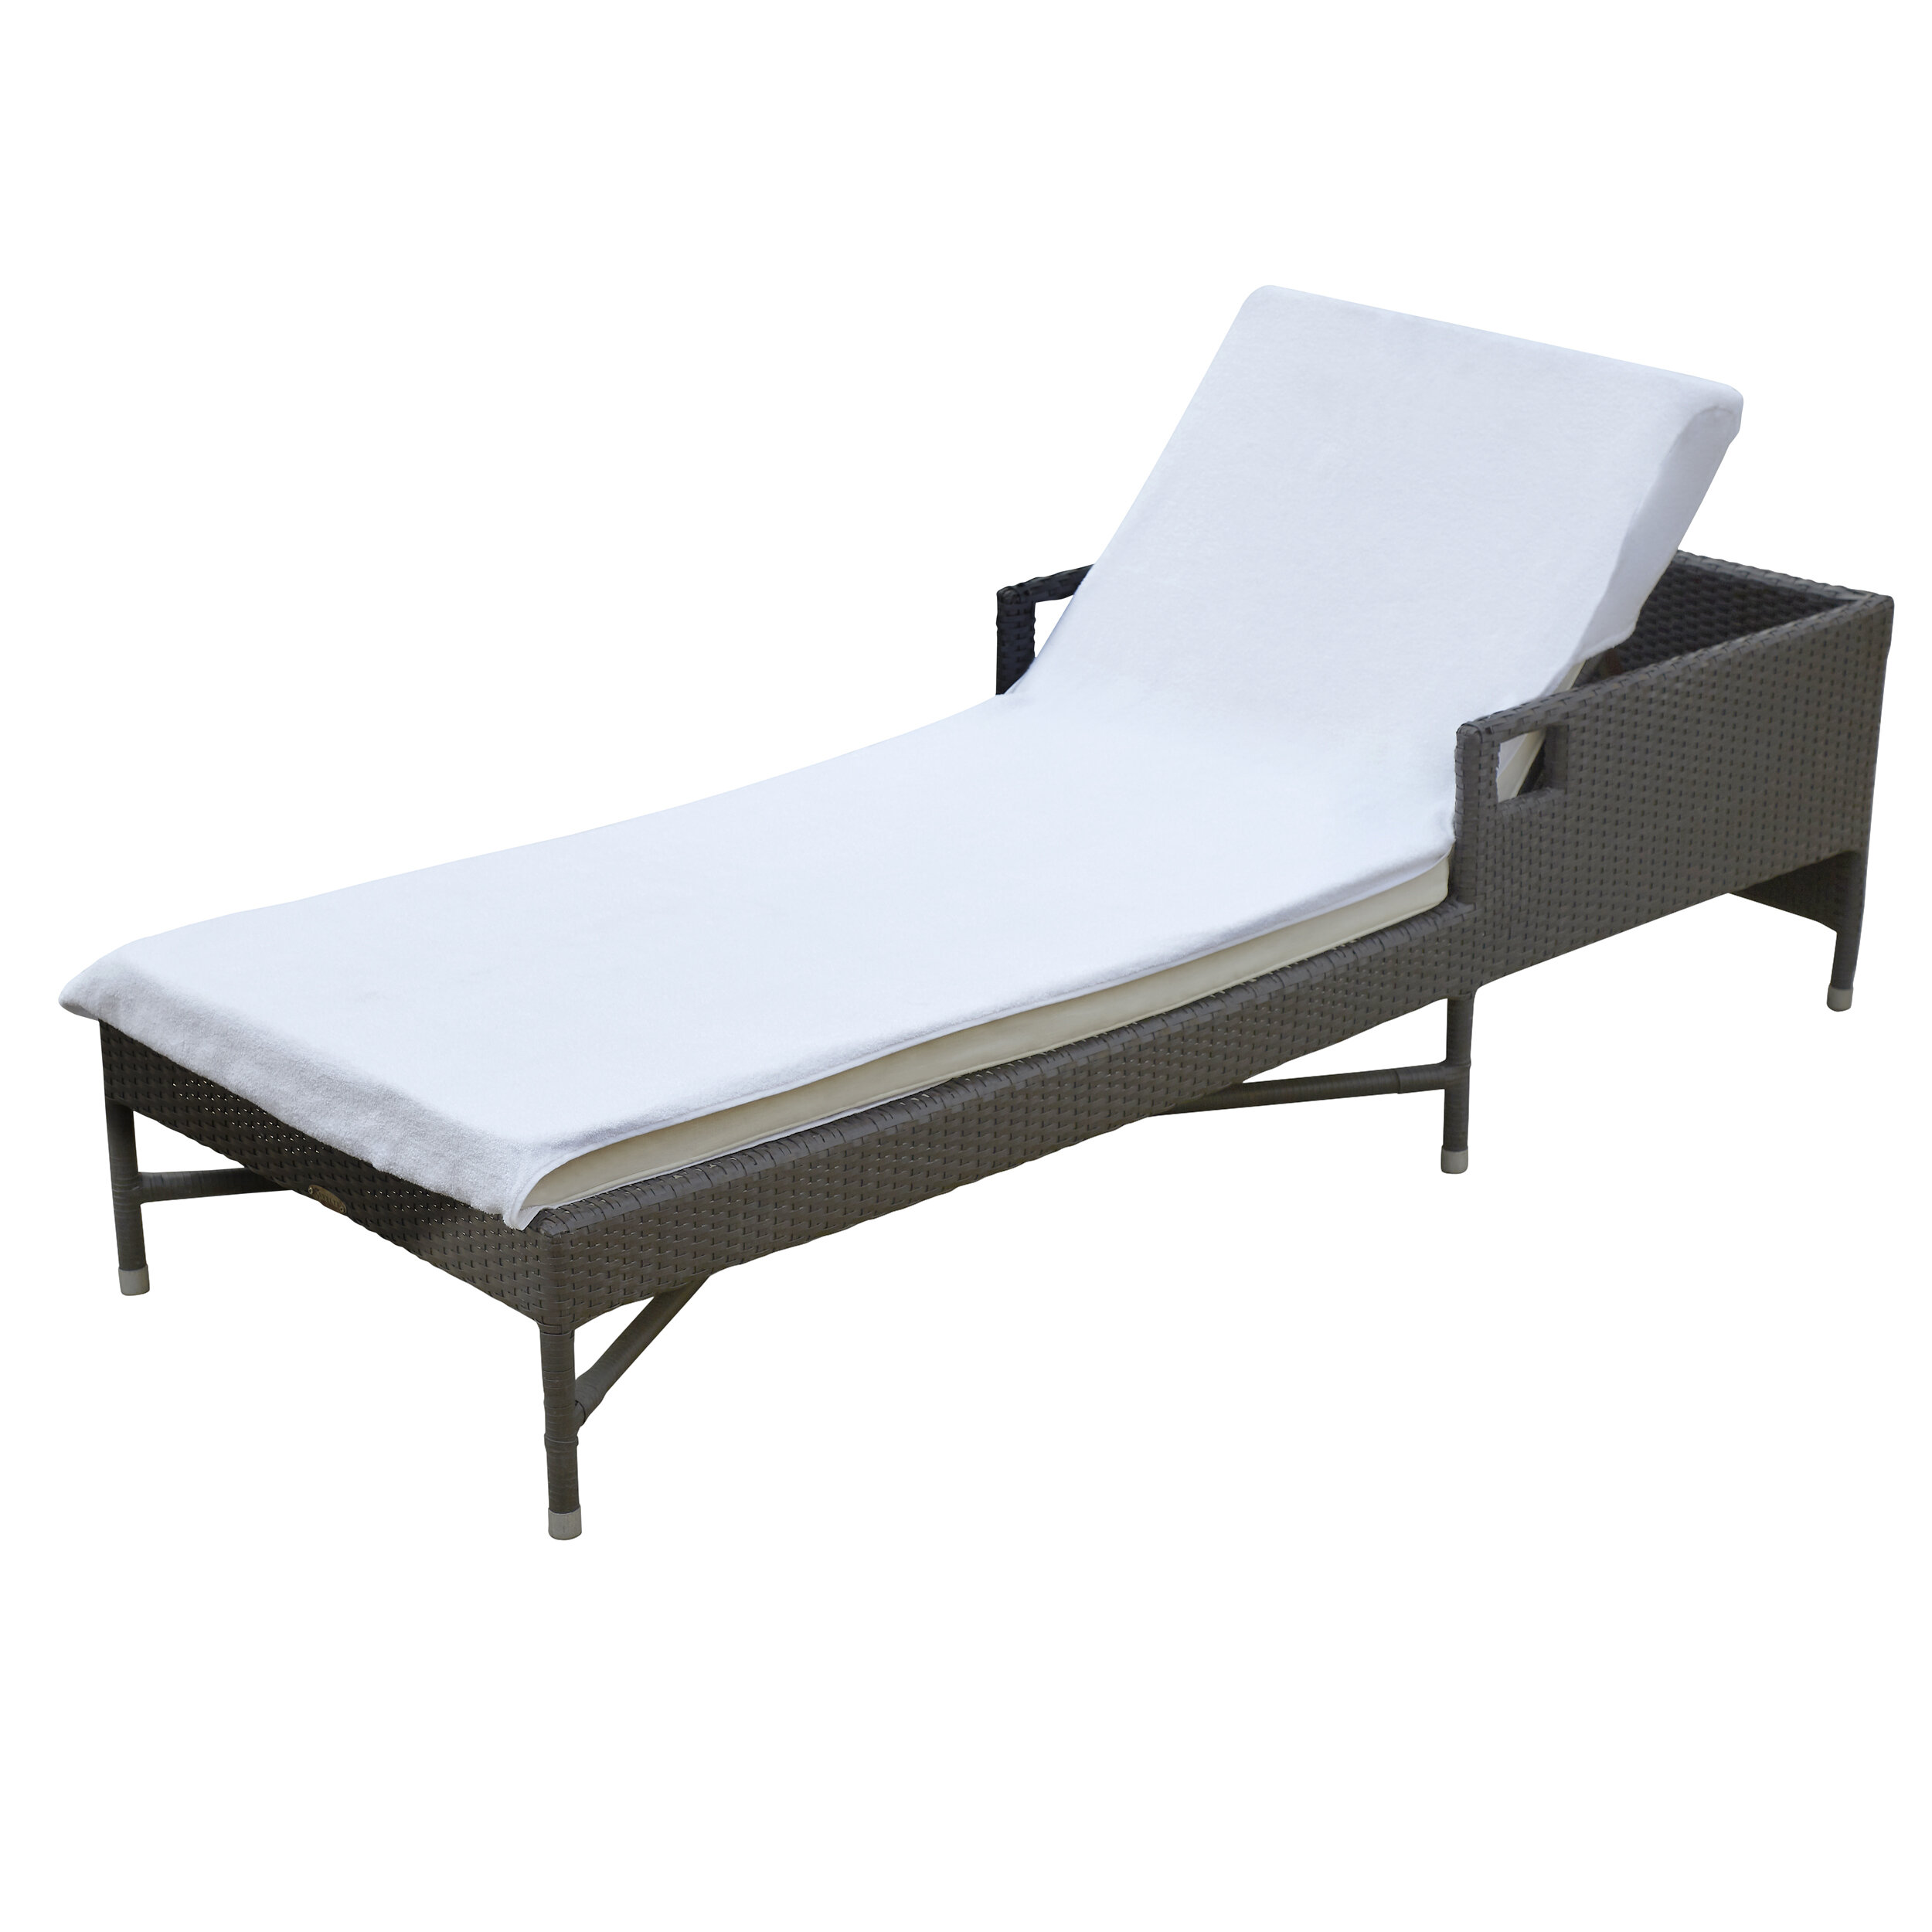 Ebern Designs Patio Chaise Lounge Cover